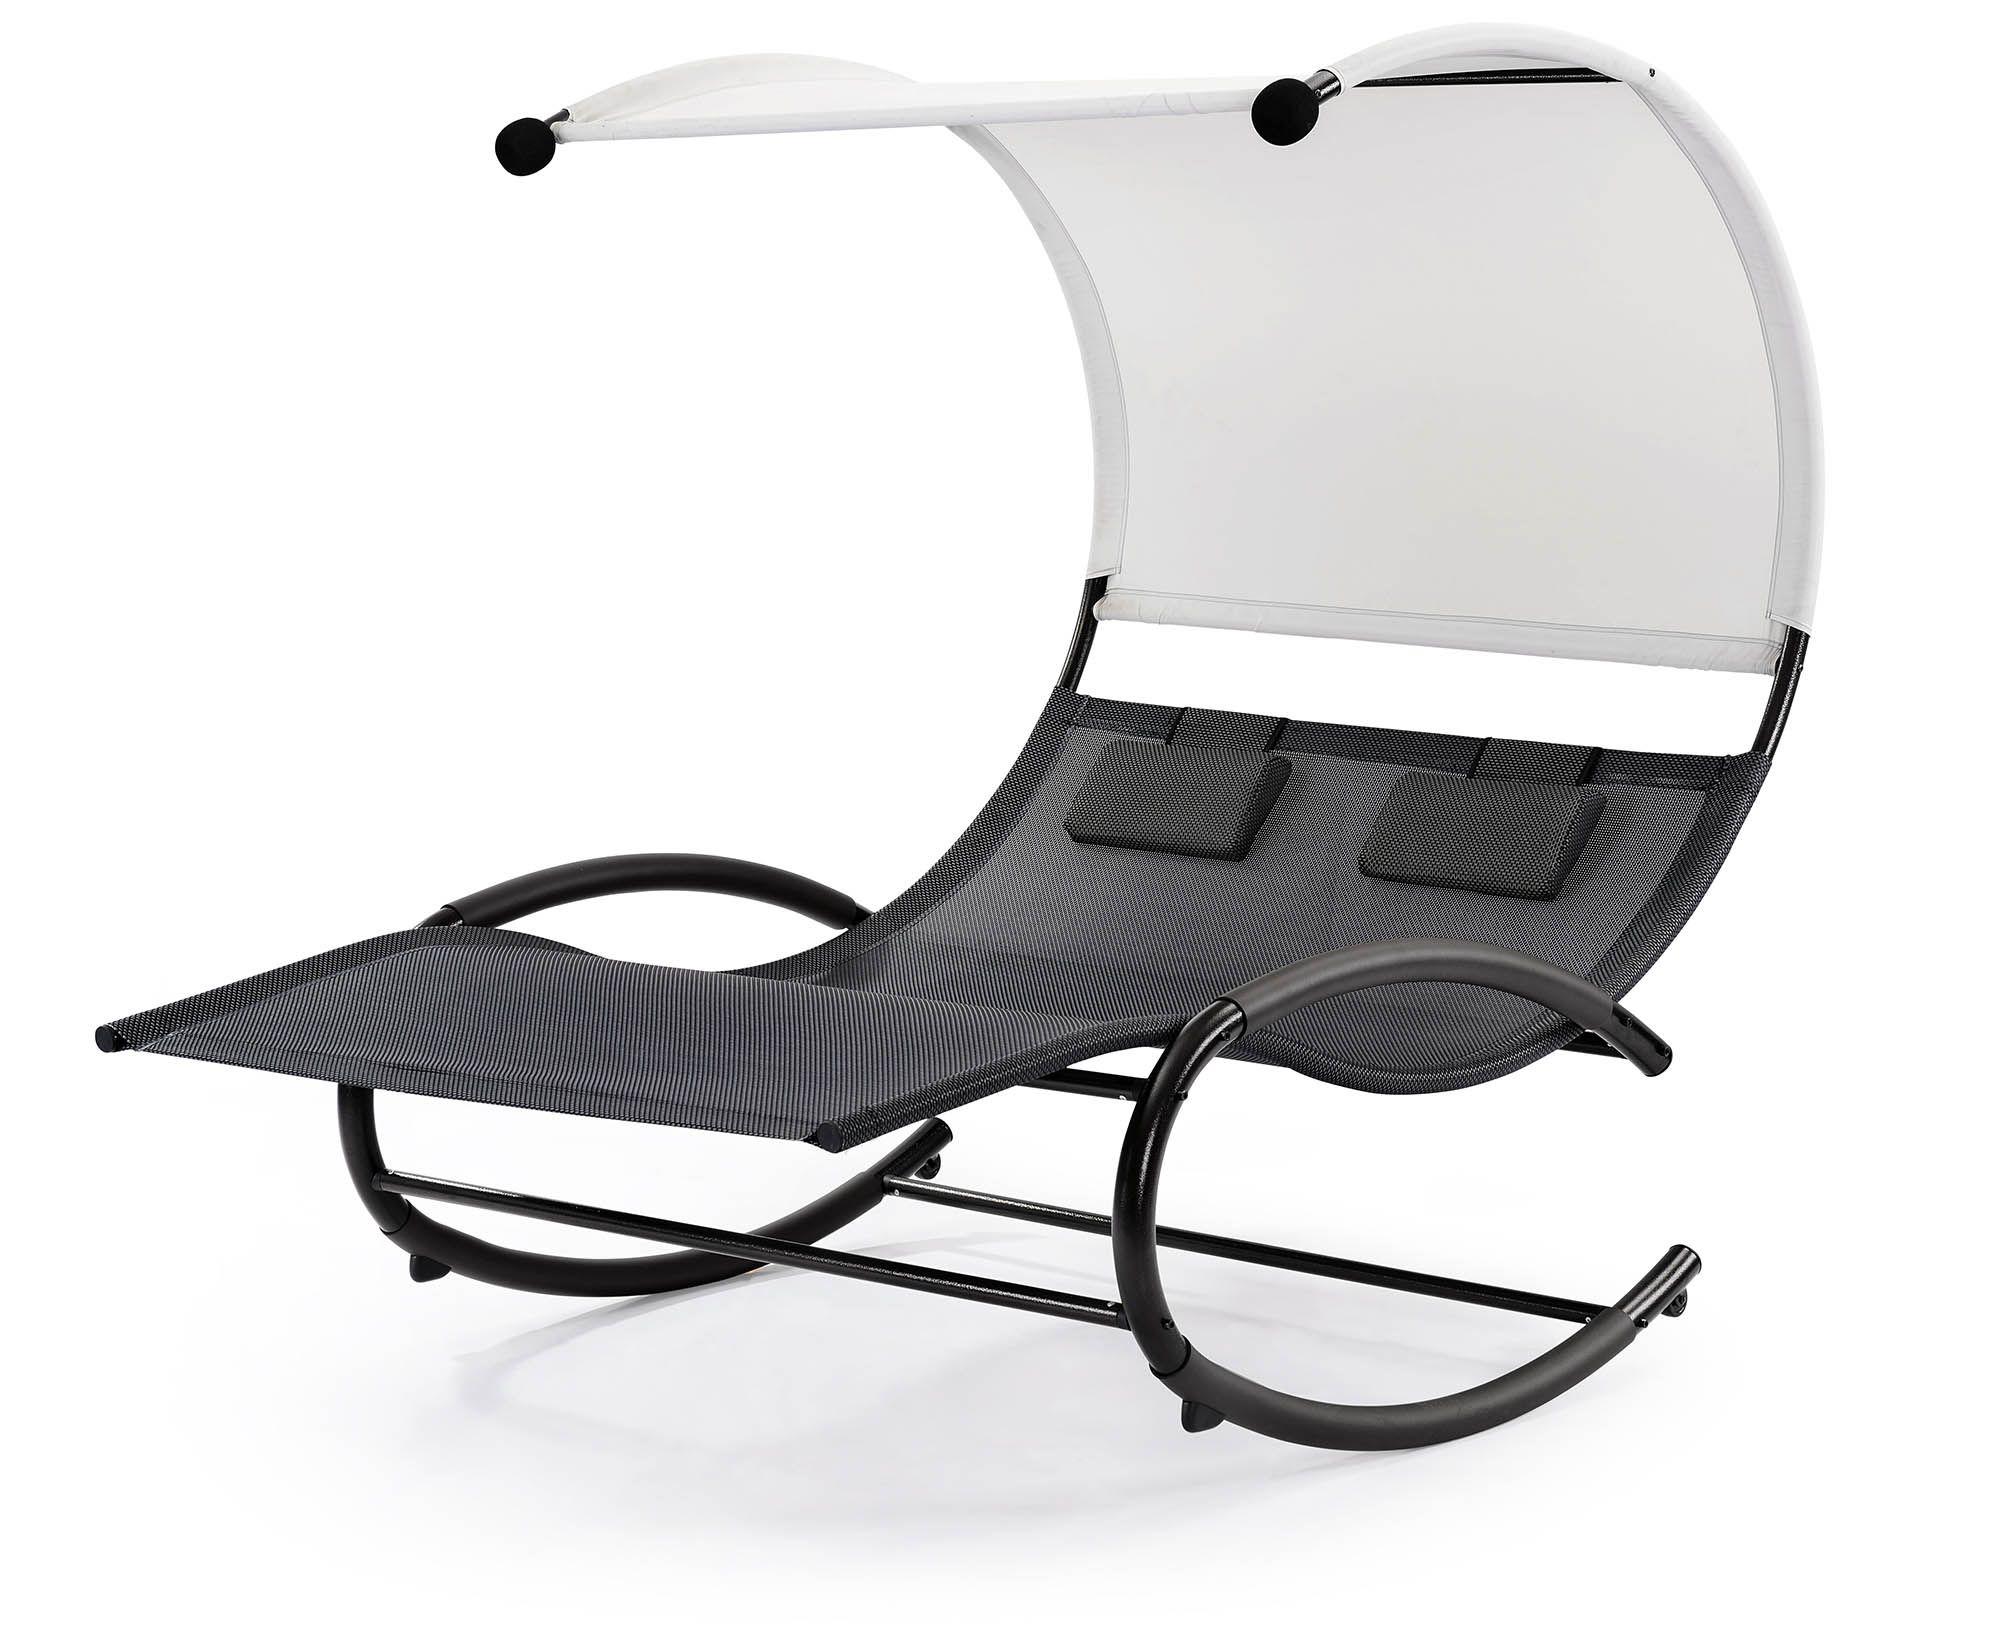 Cadeira Chaise Importada *Passion - Área Externa, Piscina, Varanda, Jardim, Gazebo